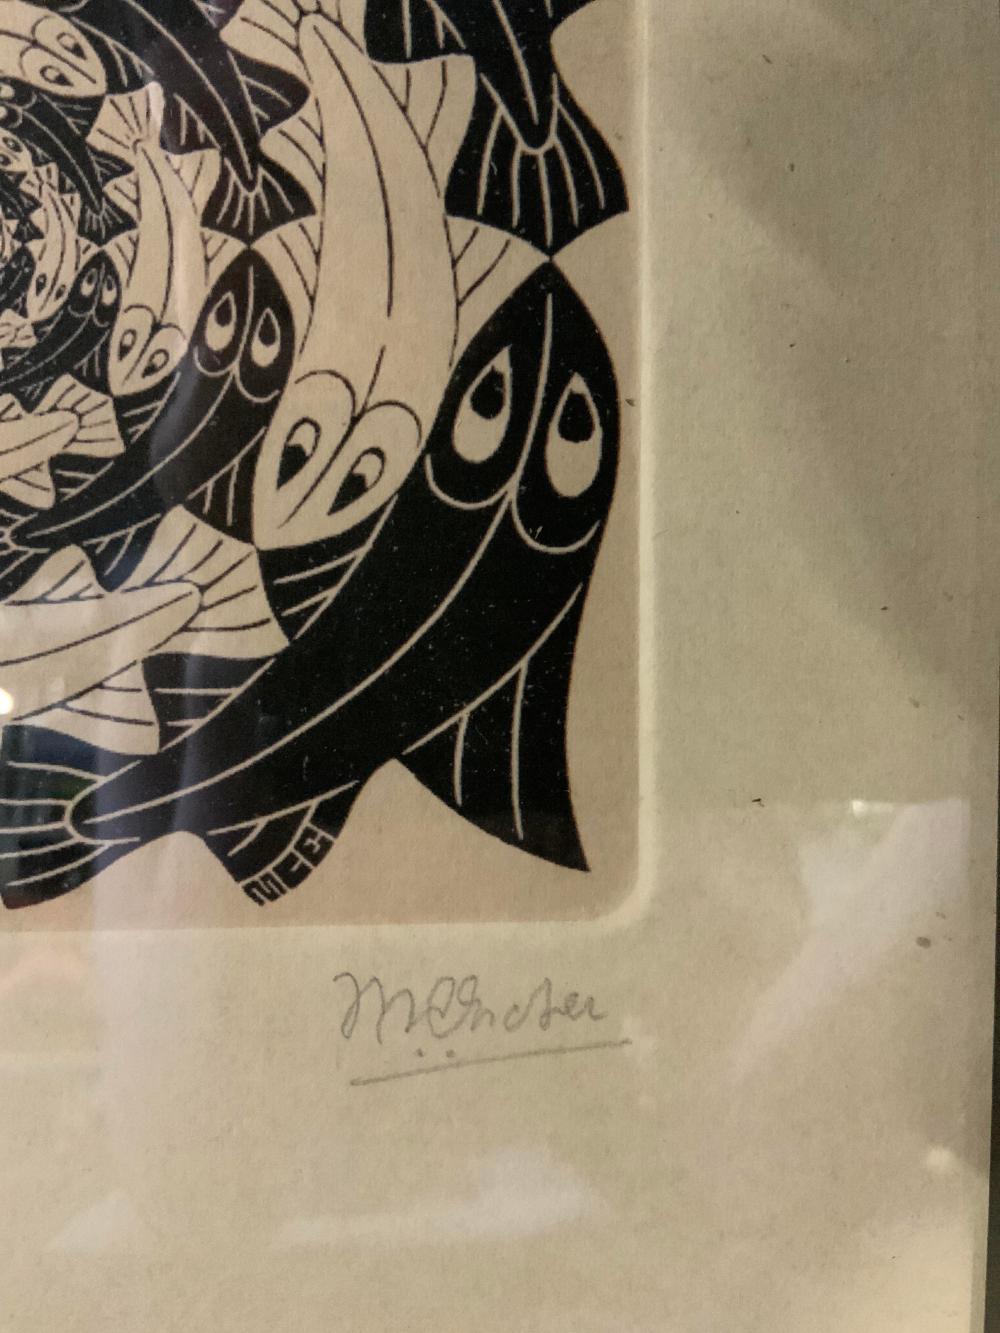 ATTR MAURTIS CORNELIS ESCHER Signed Lithograph